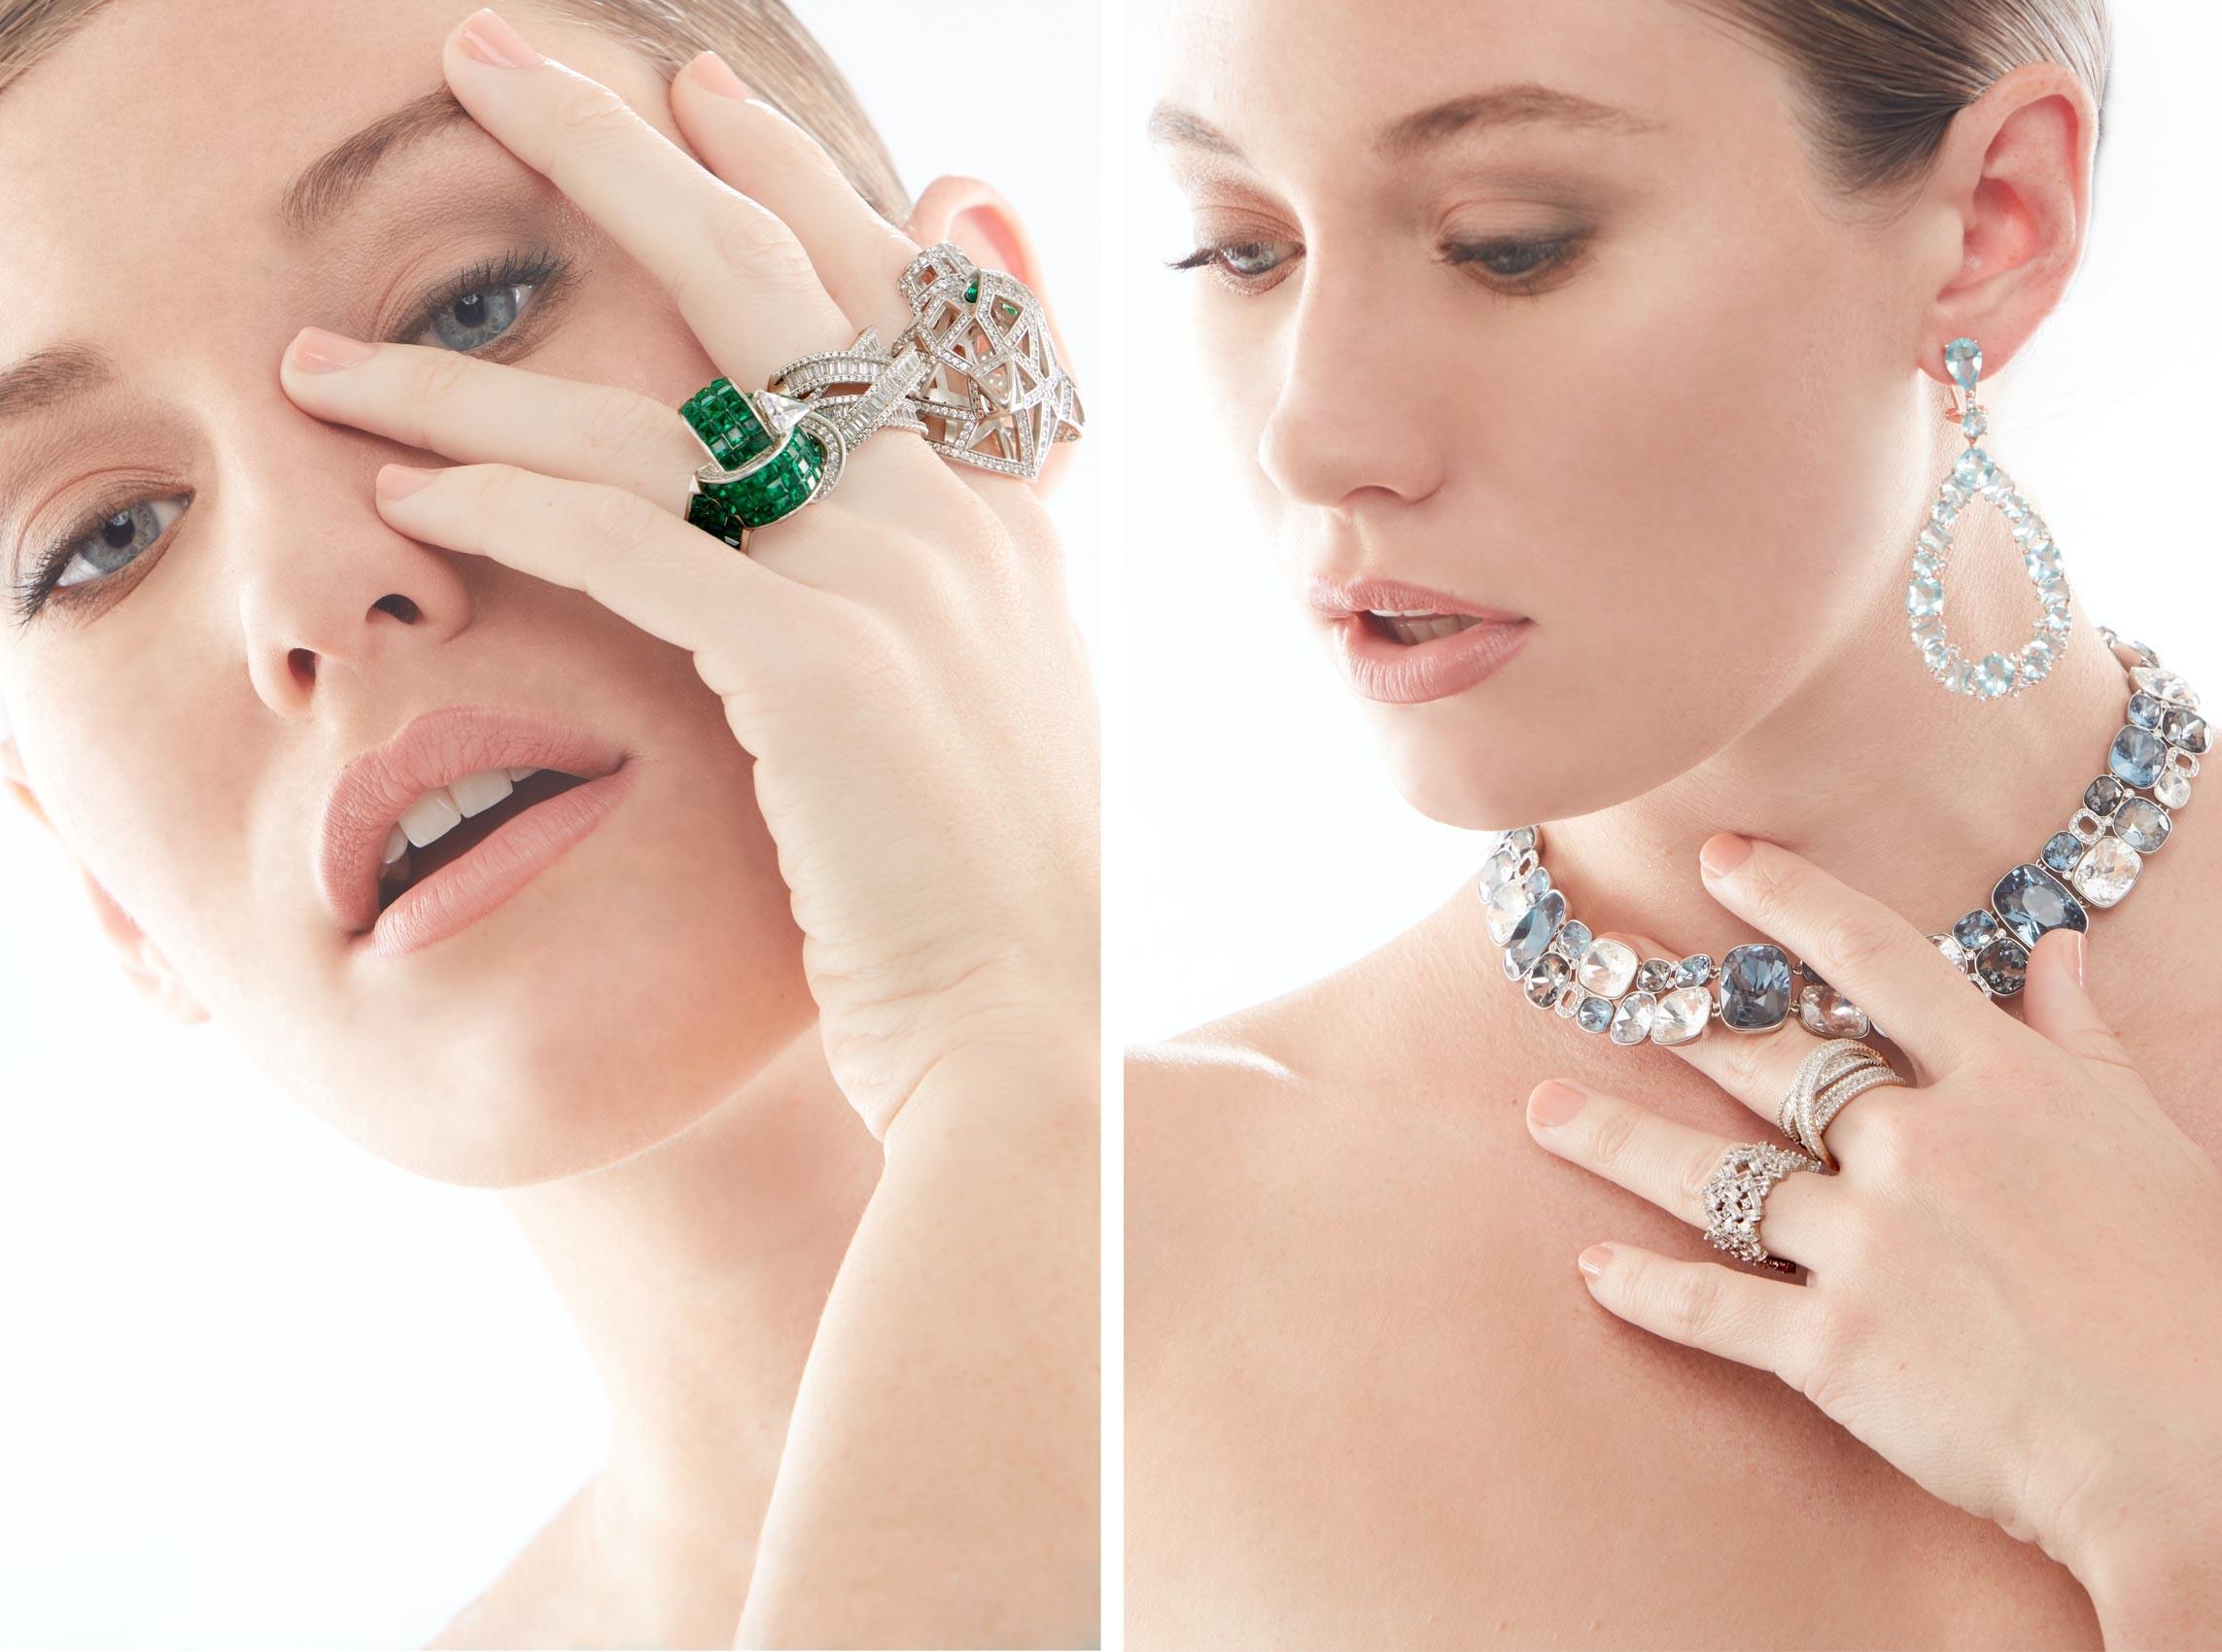 jewelry-web-2-1-copy.jpg